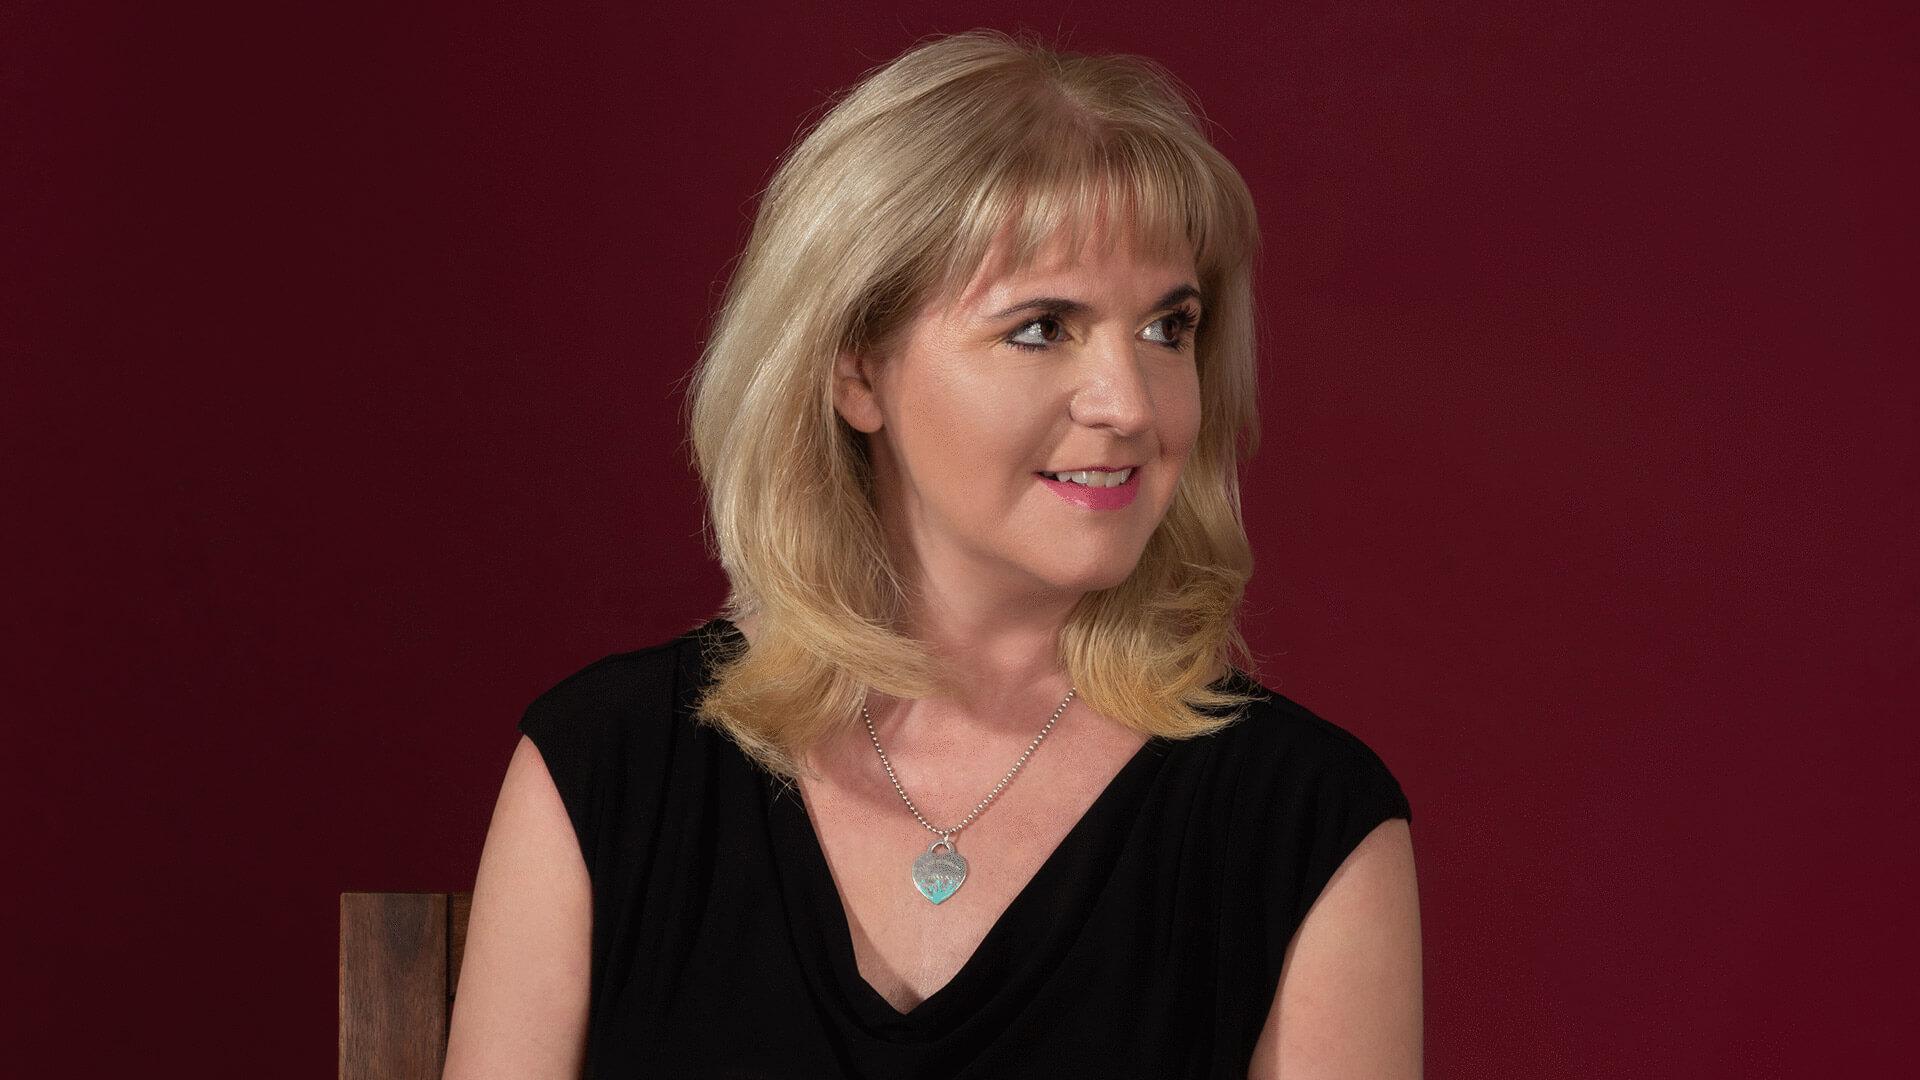 Tania Goodman